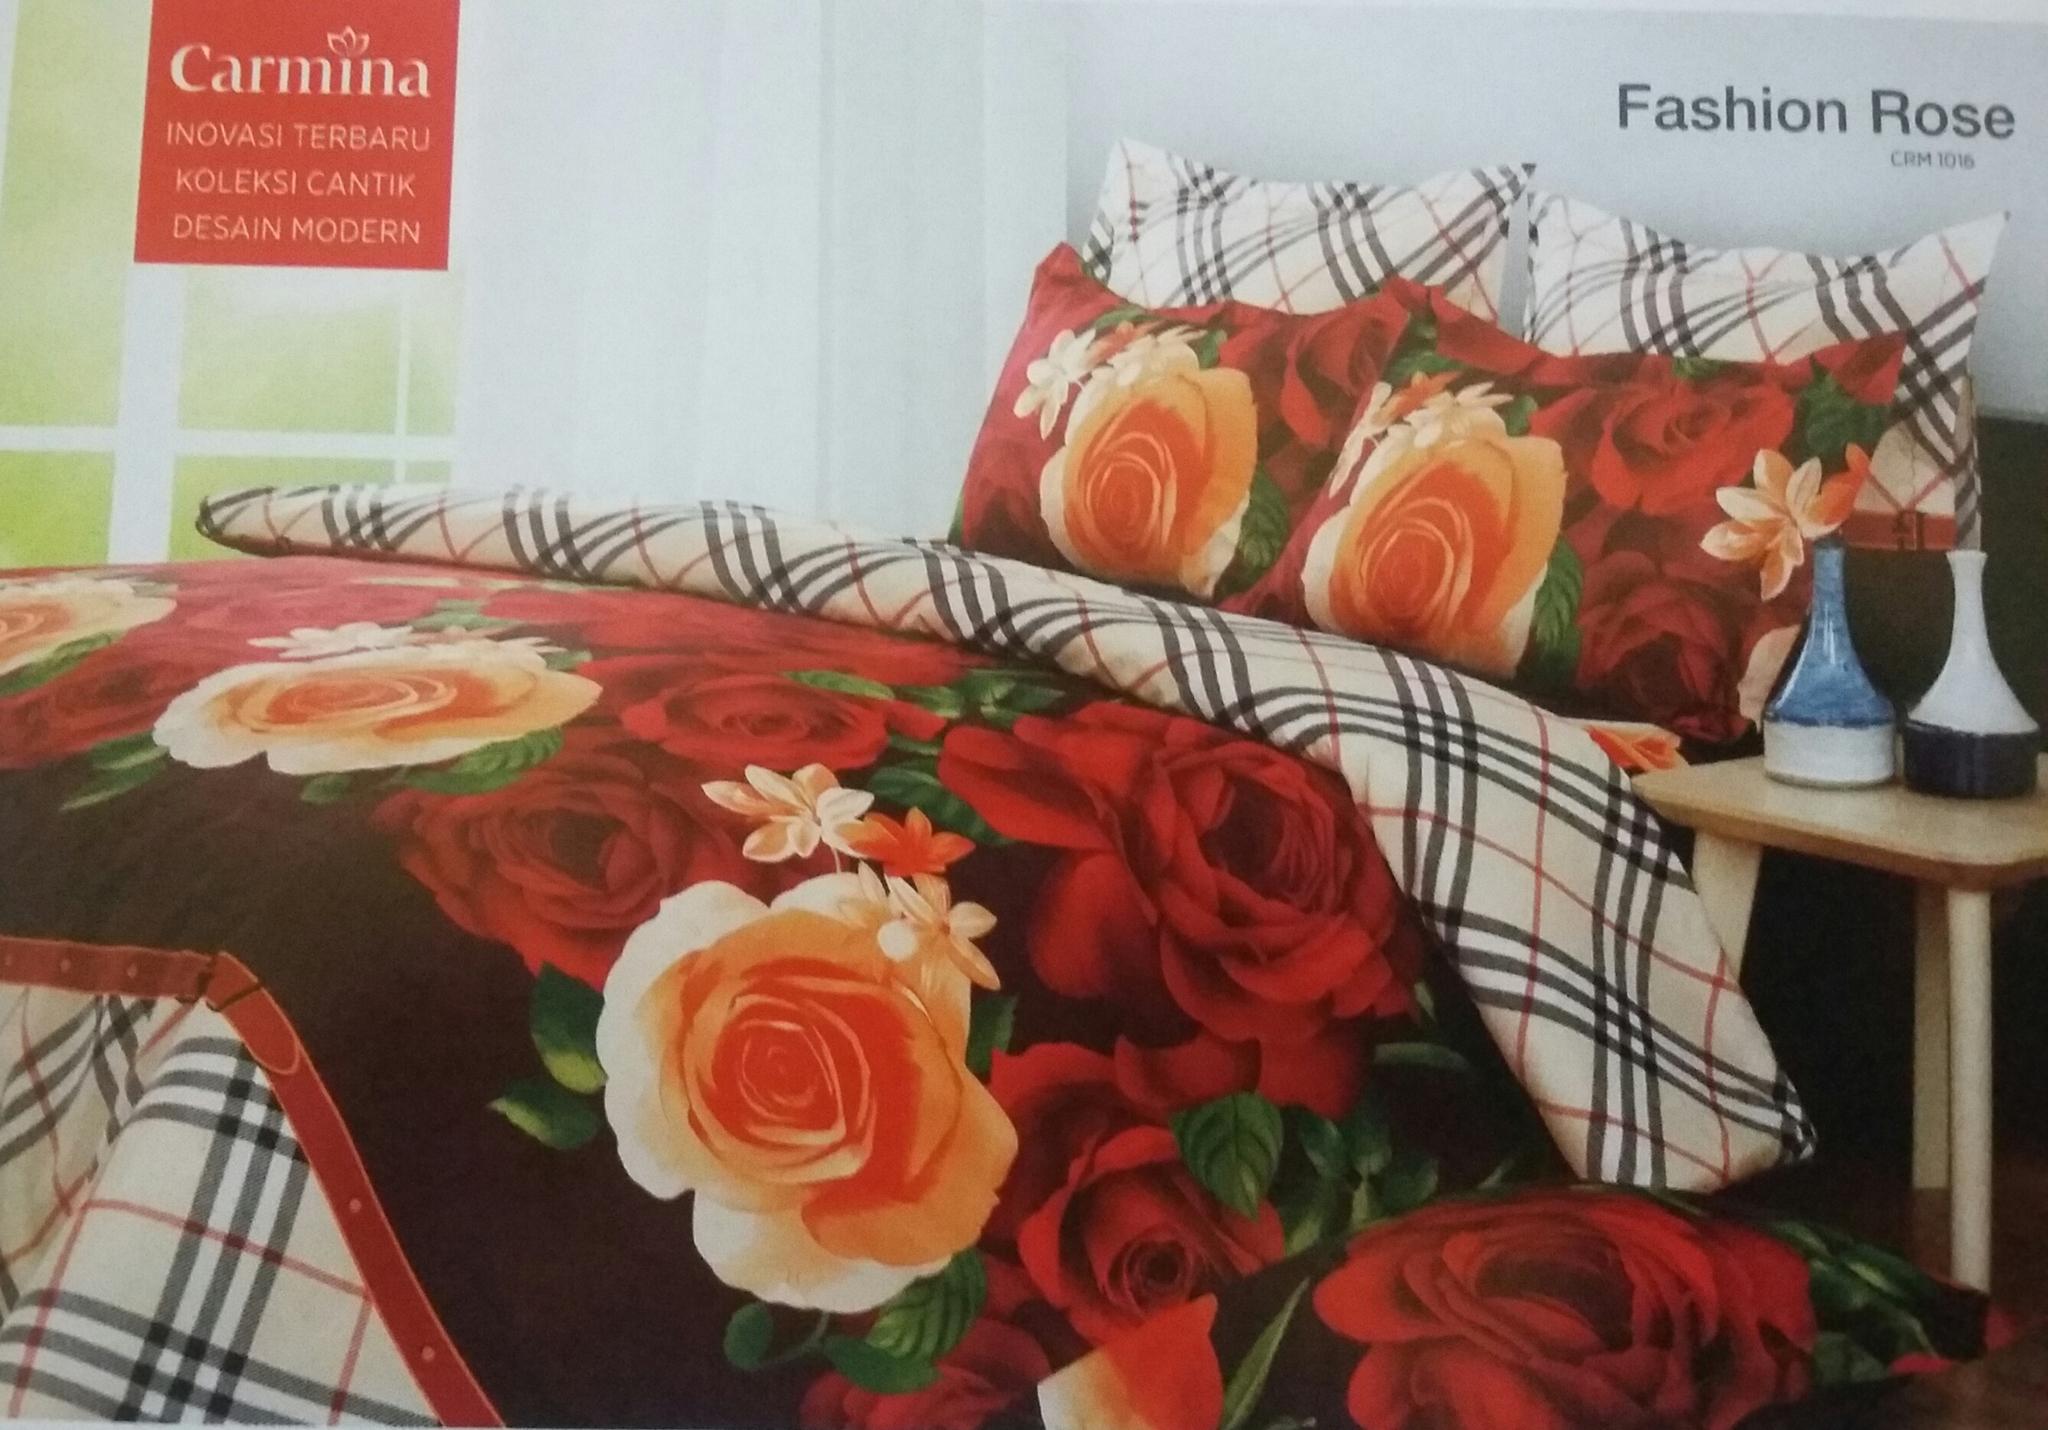 Jual SPREI CARMINA BATIK KING 180 X 200 MOTIF FASHION ROSE - Rannia Collection   Tokopedia